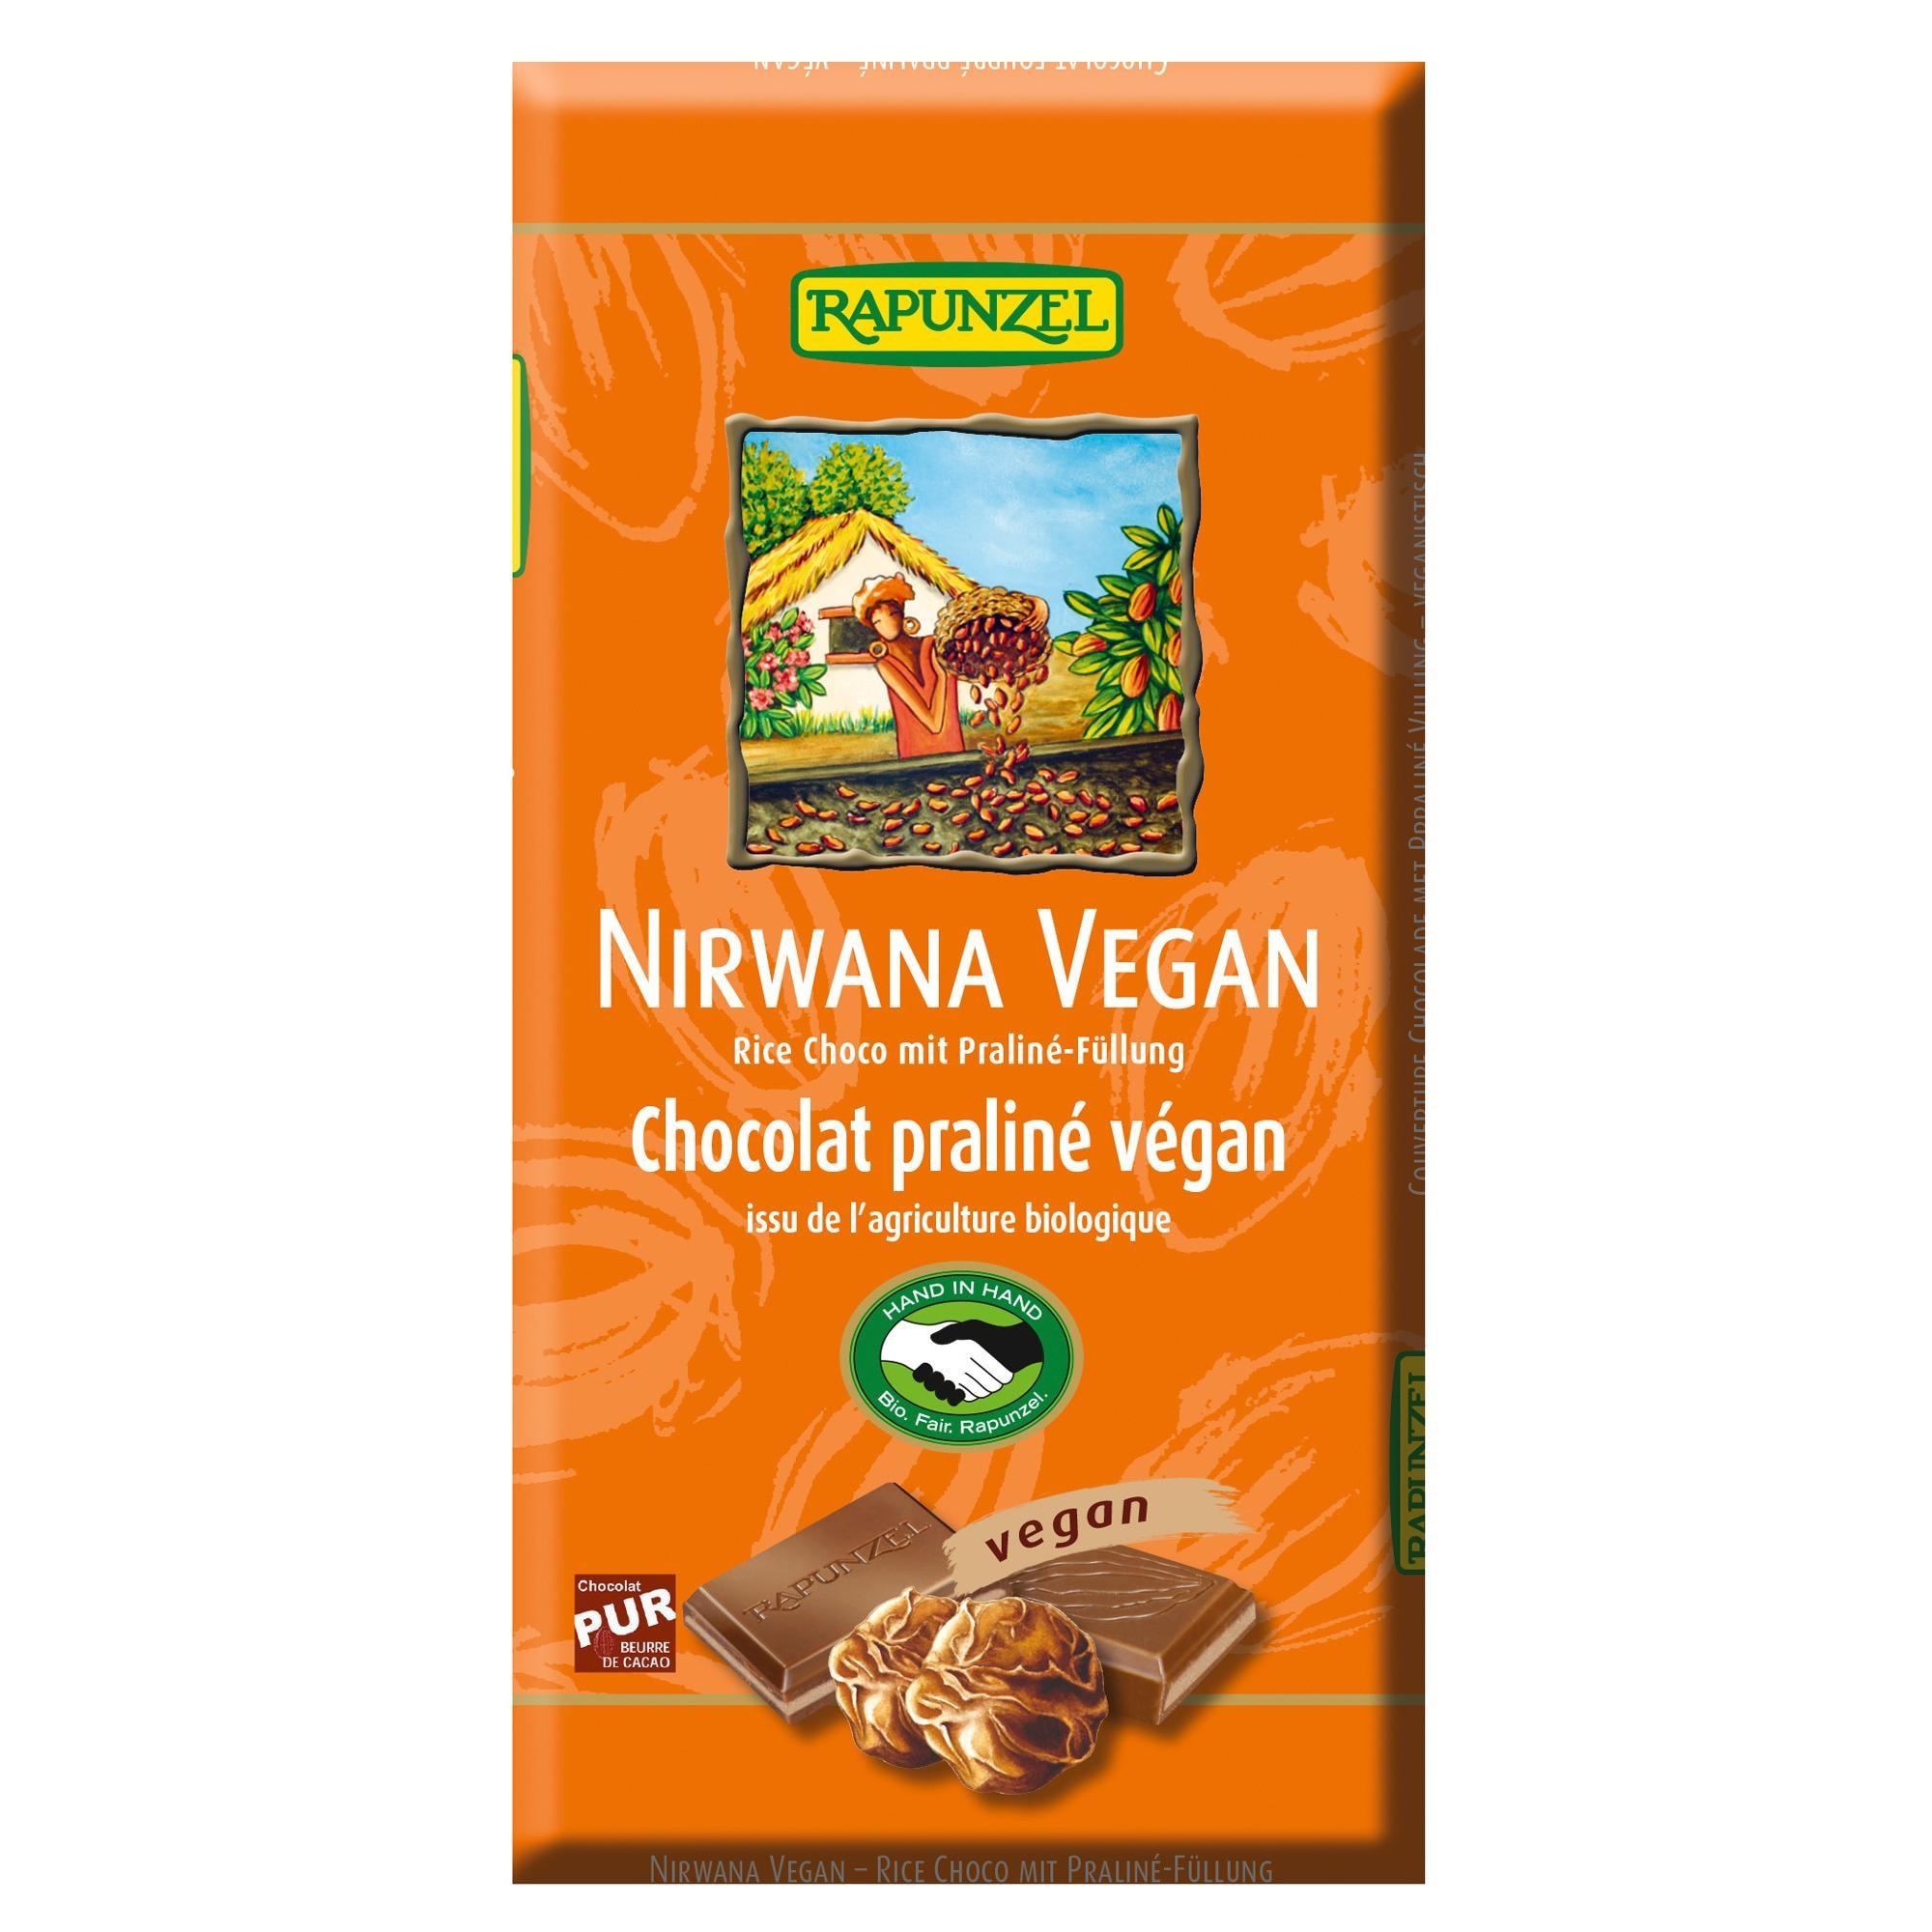 Rapunzel Bio Nirwana Vegan Schokolade Rice Choco mit Praliné-Füllung 100g